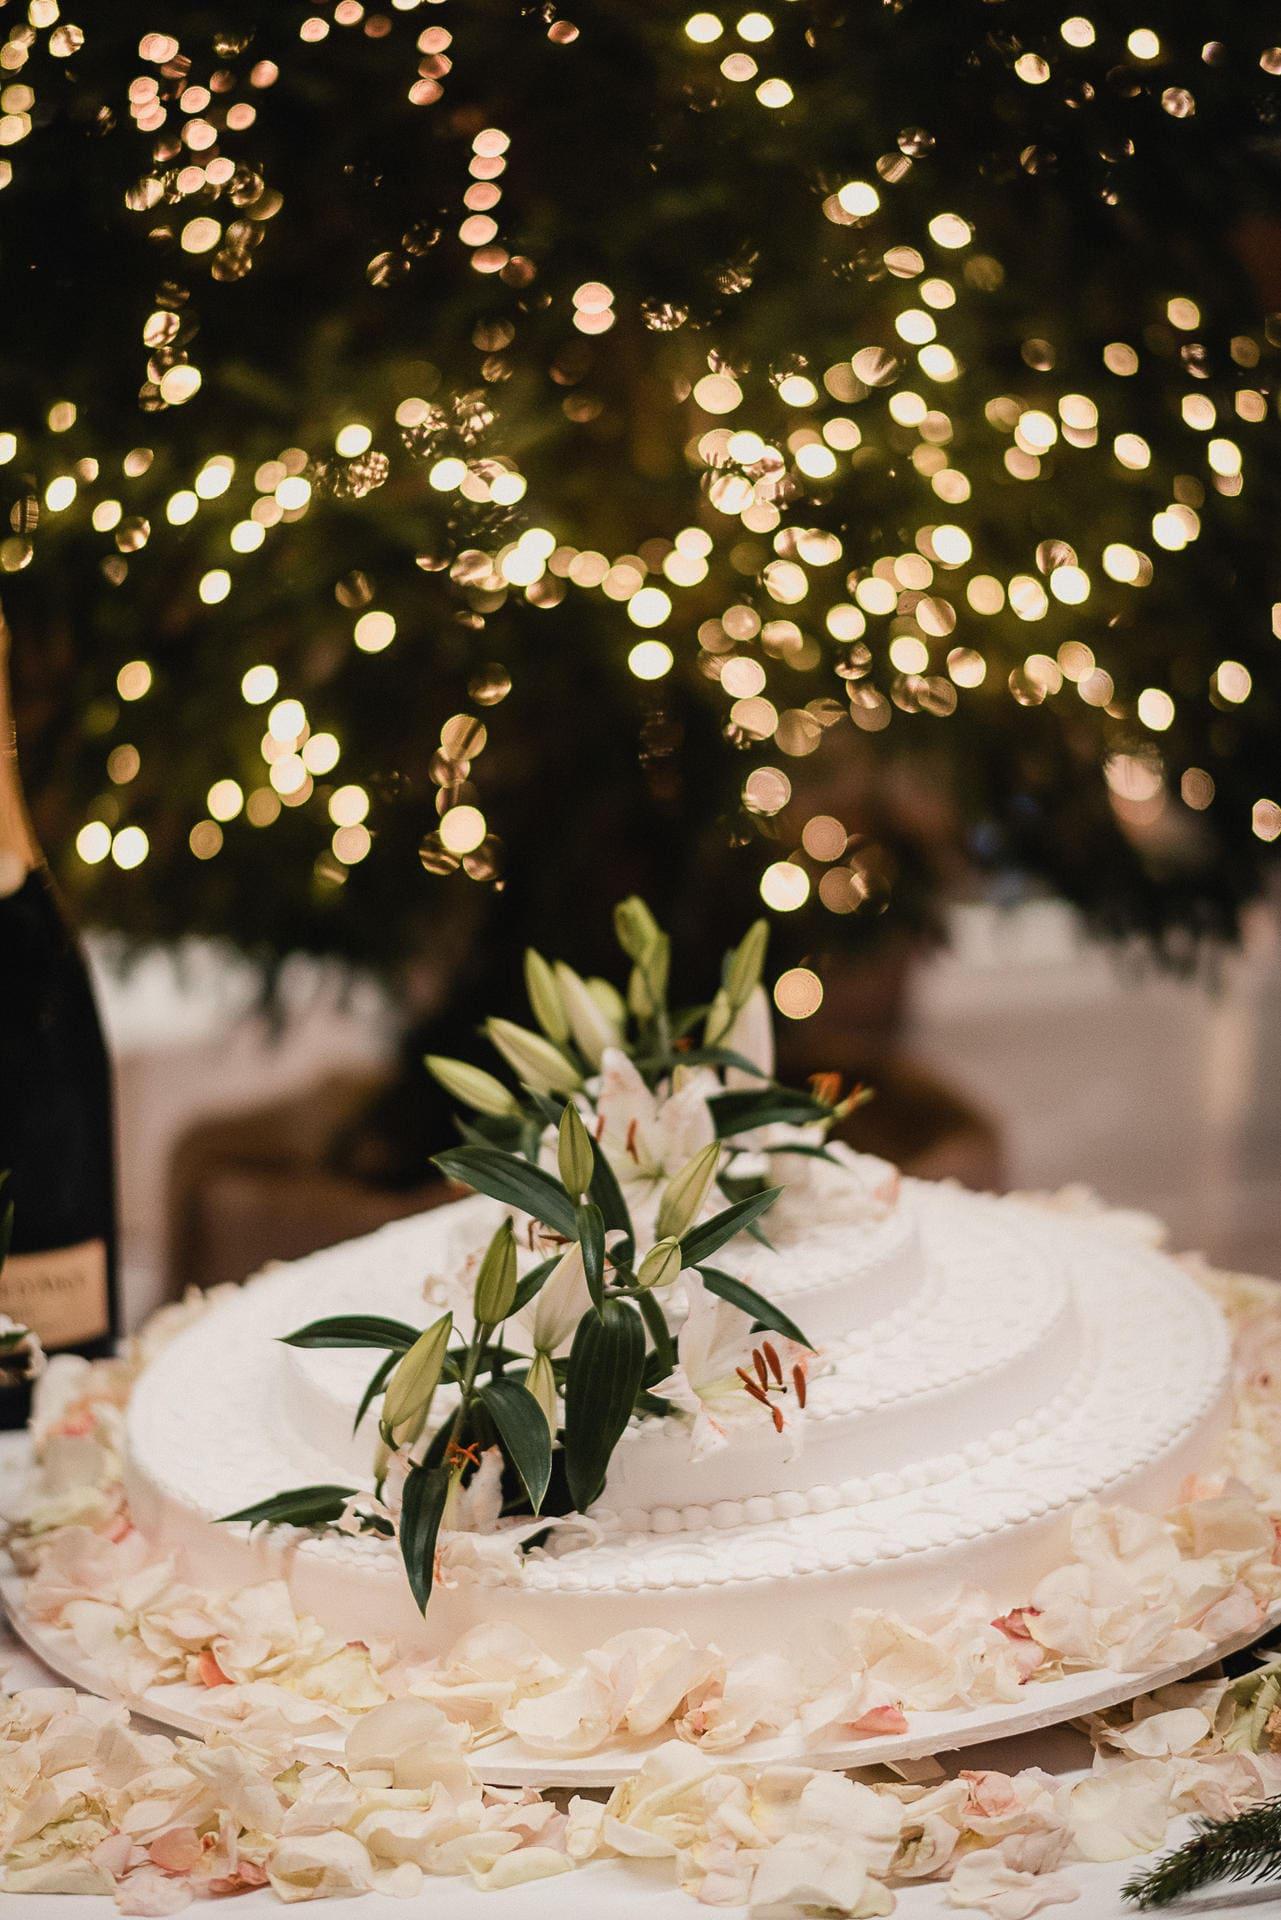 13.12.2014 - Wedding cake